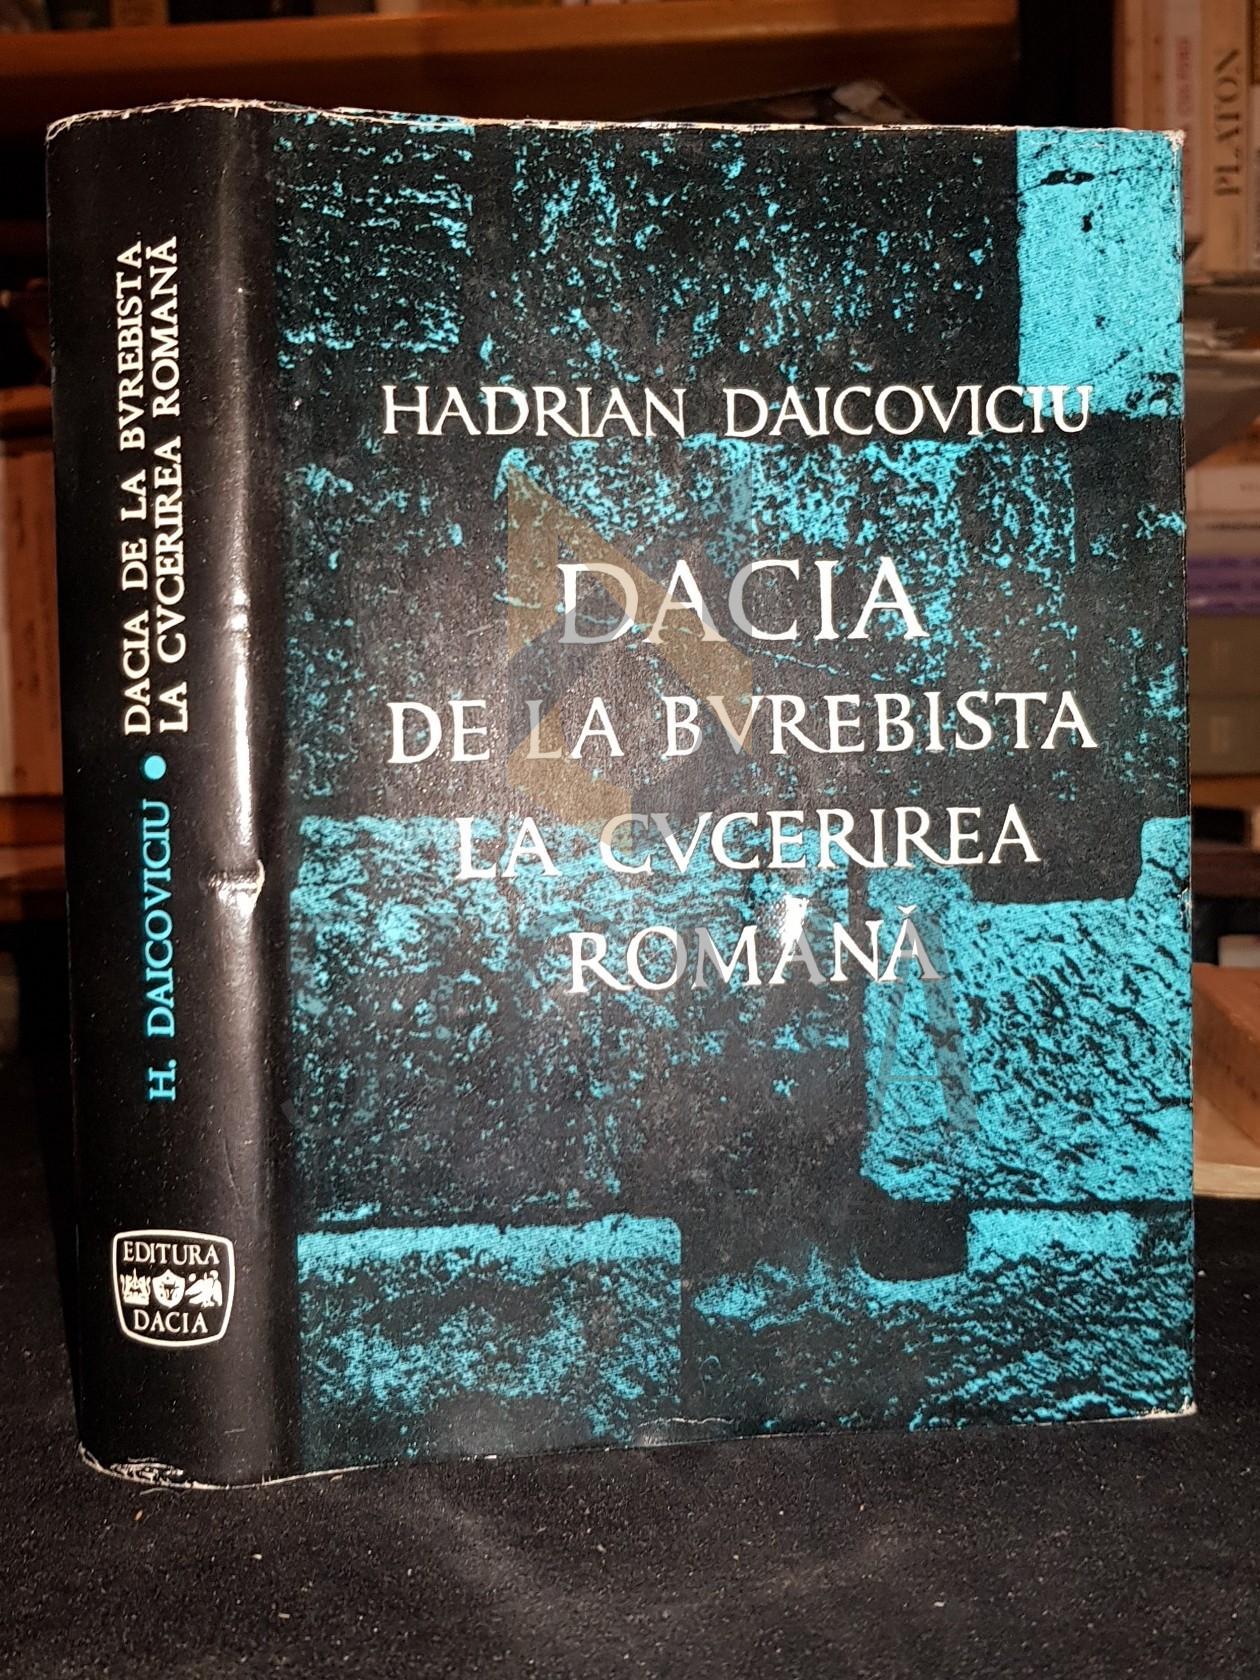 DAICOVICIU HADRIAN